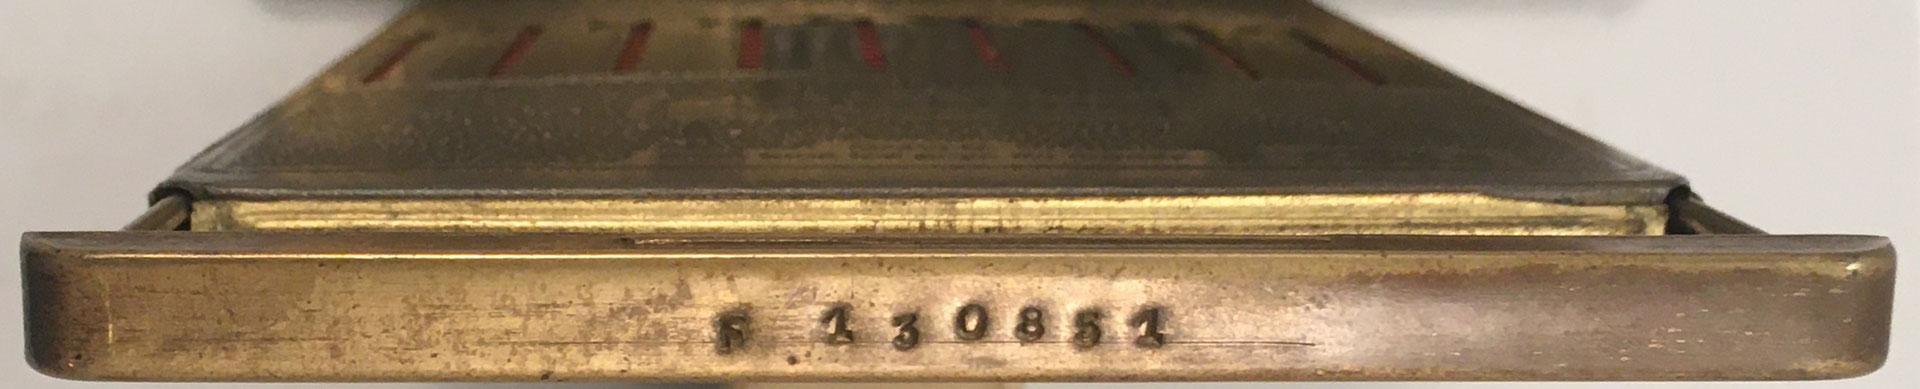 Ábaco de ranuras ADDIATOR, detalle de su s/n F-13085